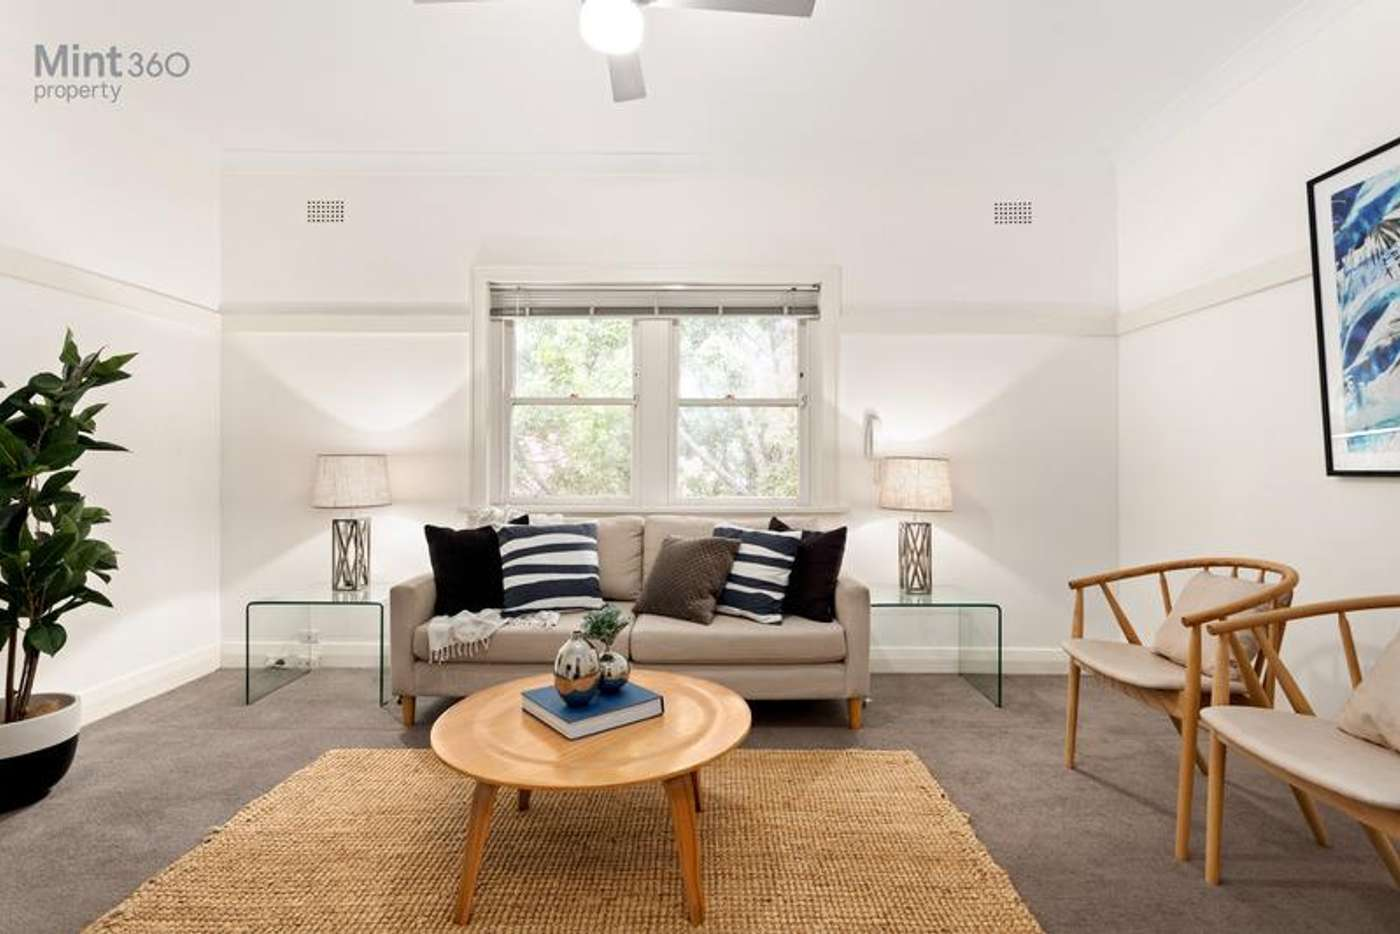 Main view of Homely apartment listing, 12/23 Waratah Avenue, Randwick NSW 2031